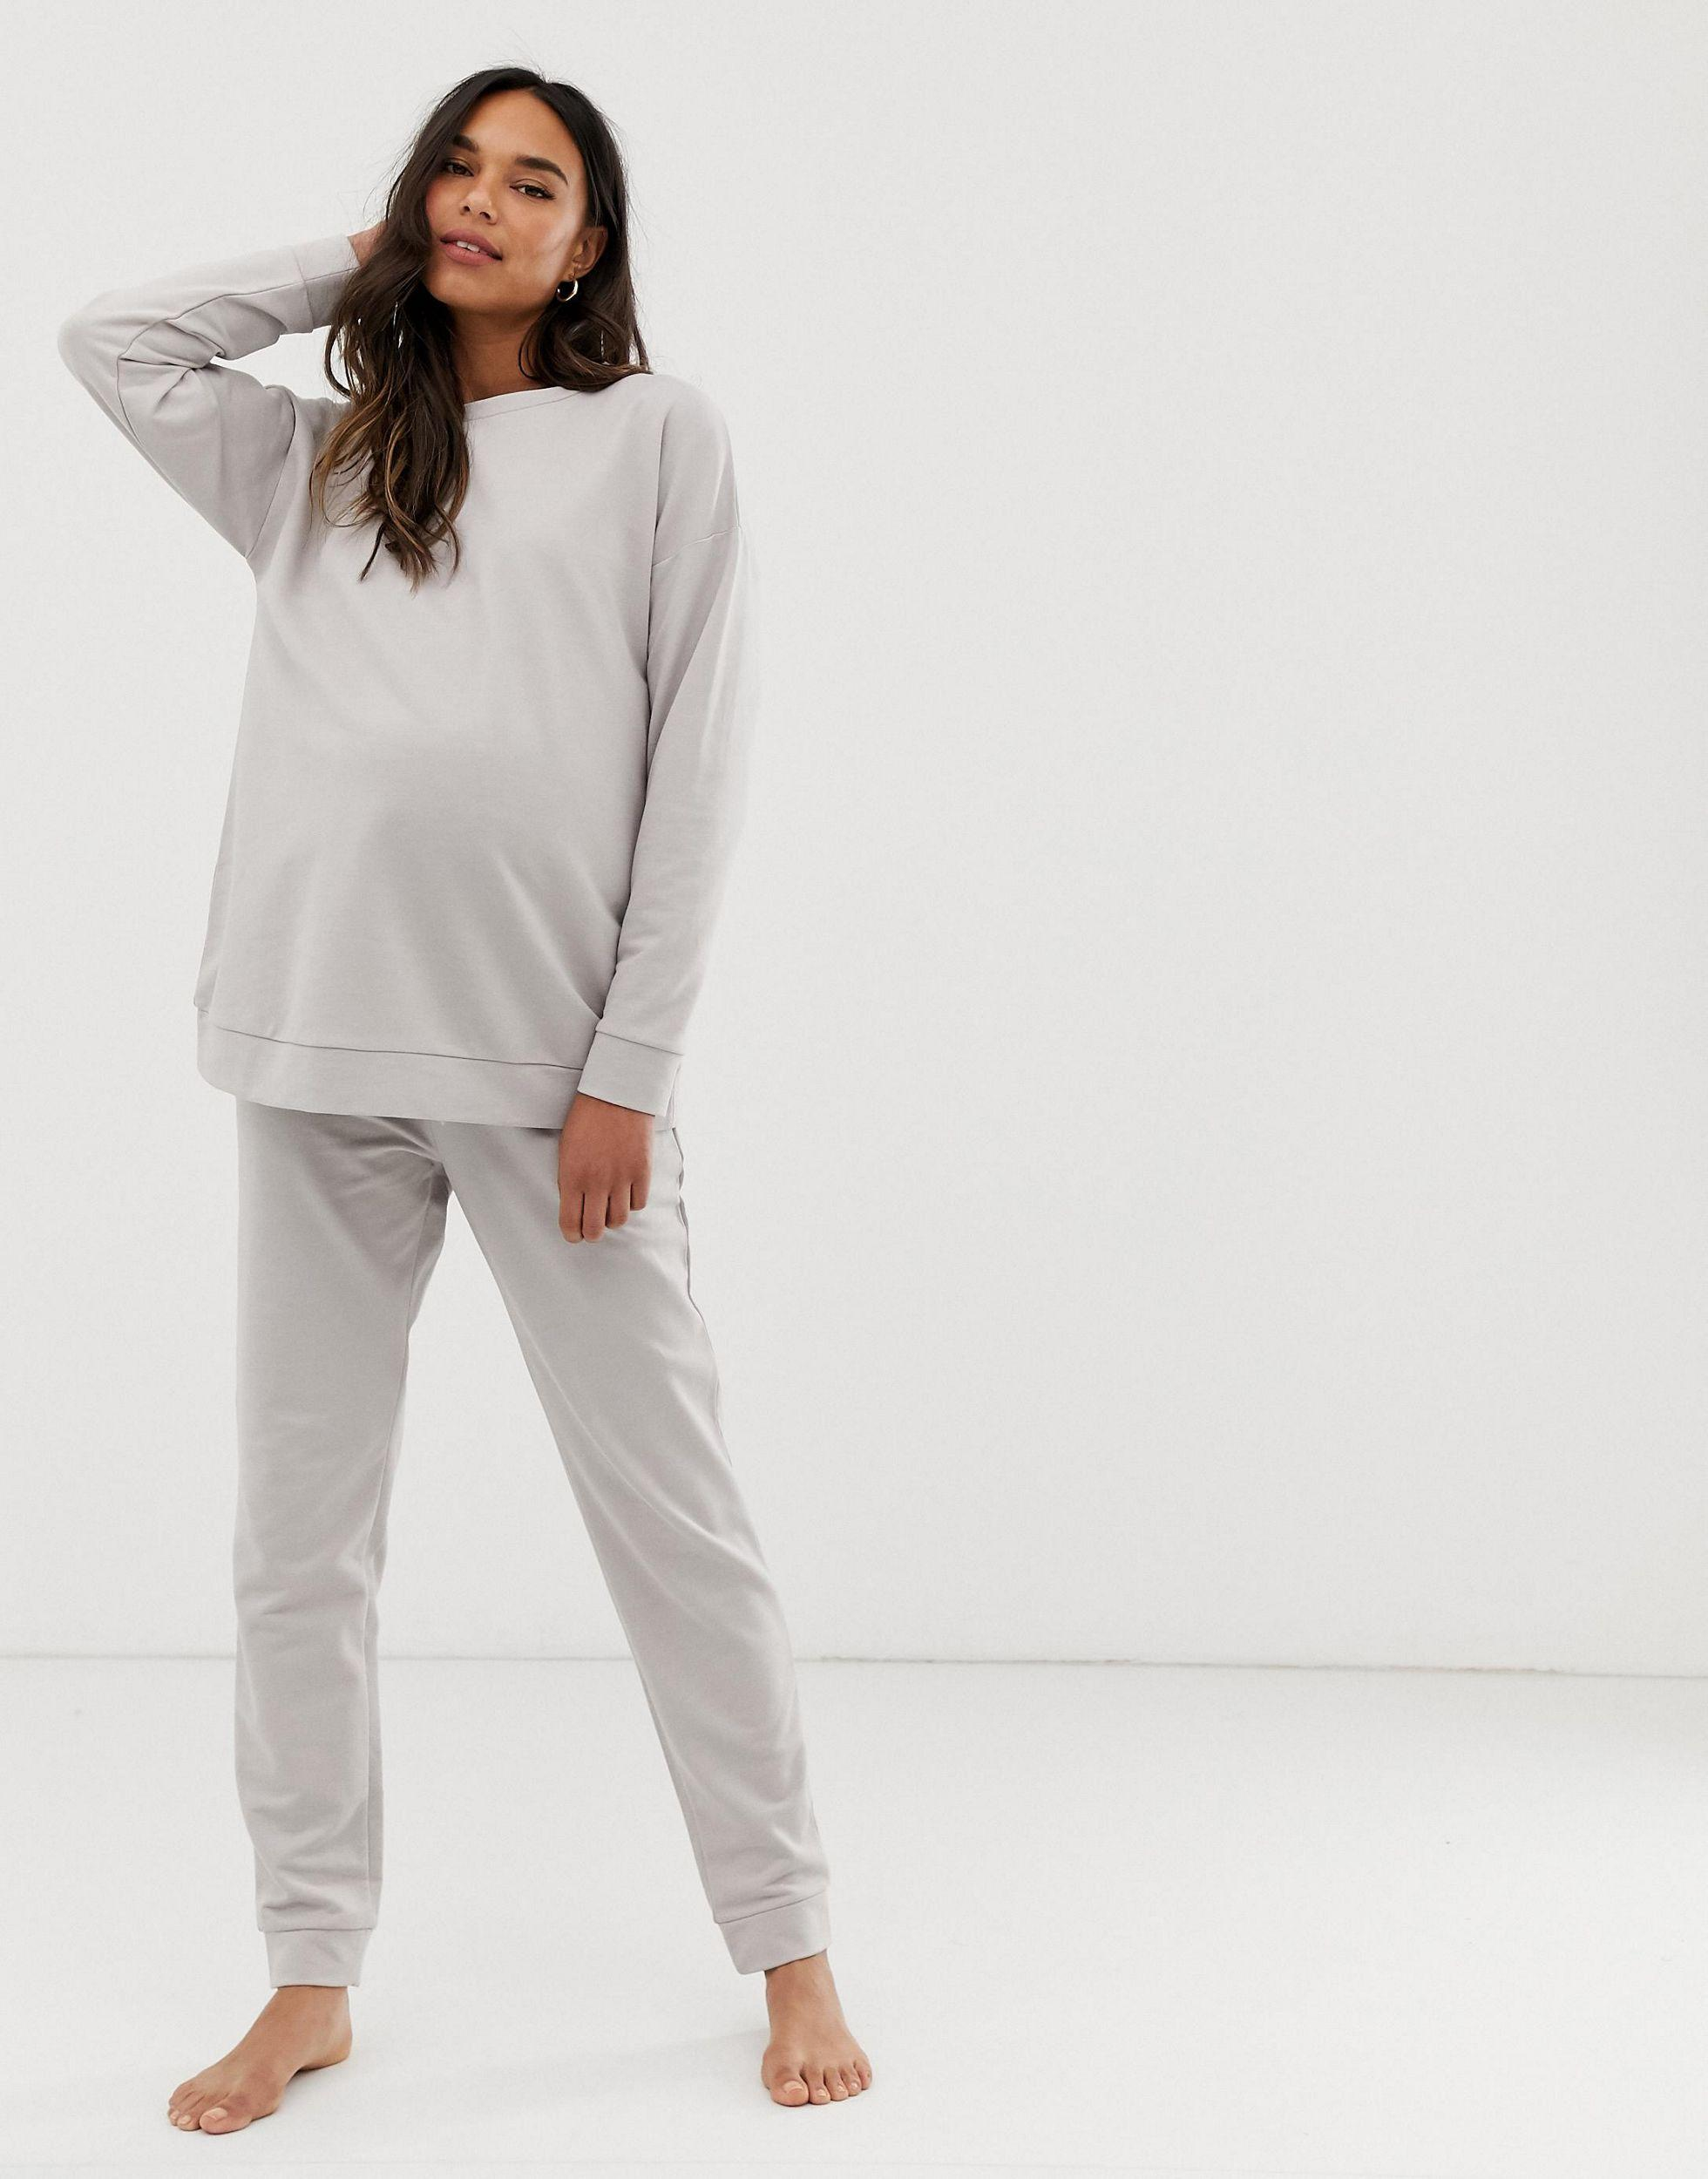 ASOS DESIGN Maternity - Ultimate - Sweat-shirt confort Coton ASOS en coloris Gris